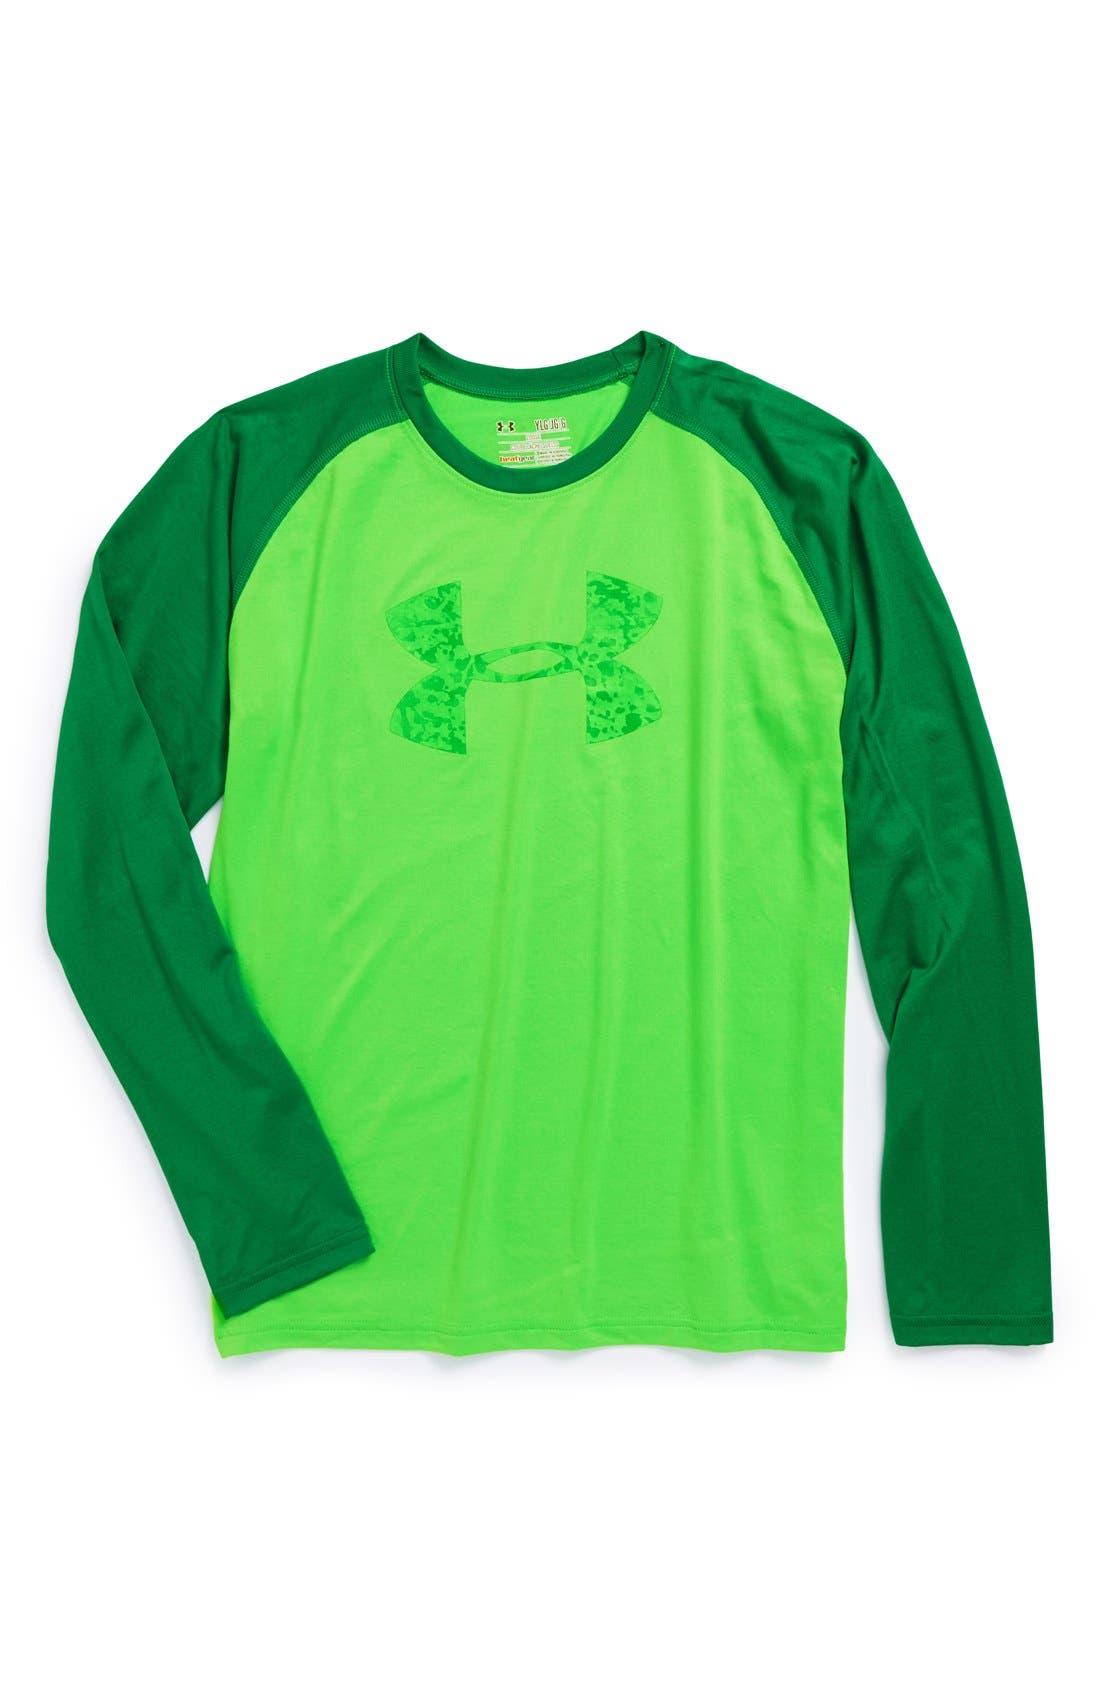 Alternate Image 1 Selected - Under Armour HeatGear® Long Sleeve T-Shirt (Big Boys)